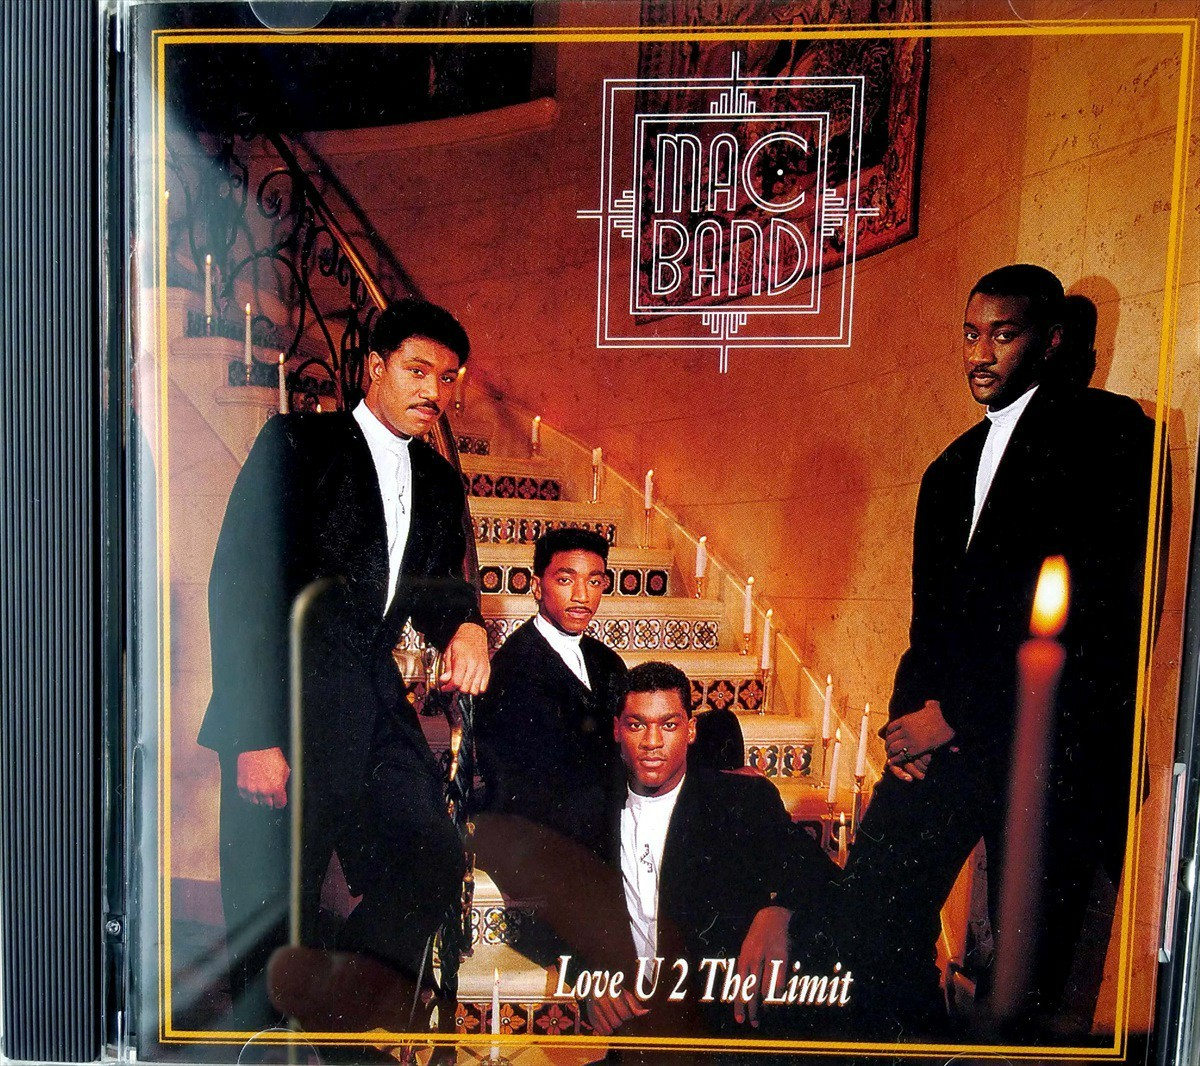 The Mac Band - Love U 2 the Limit